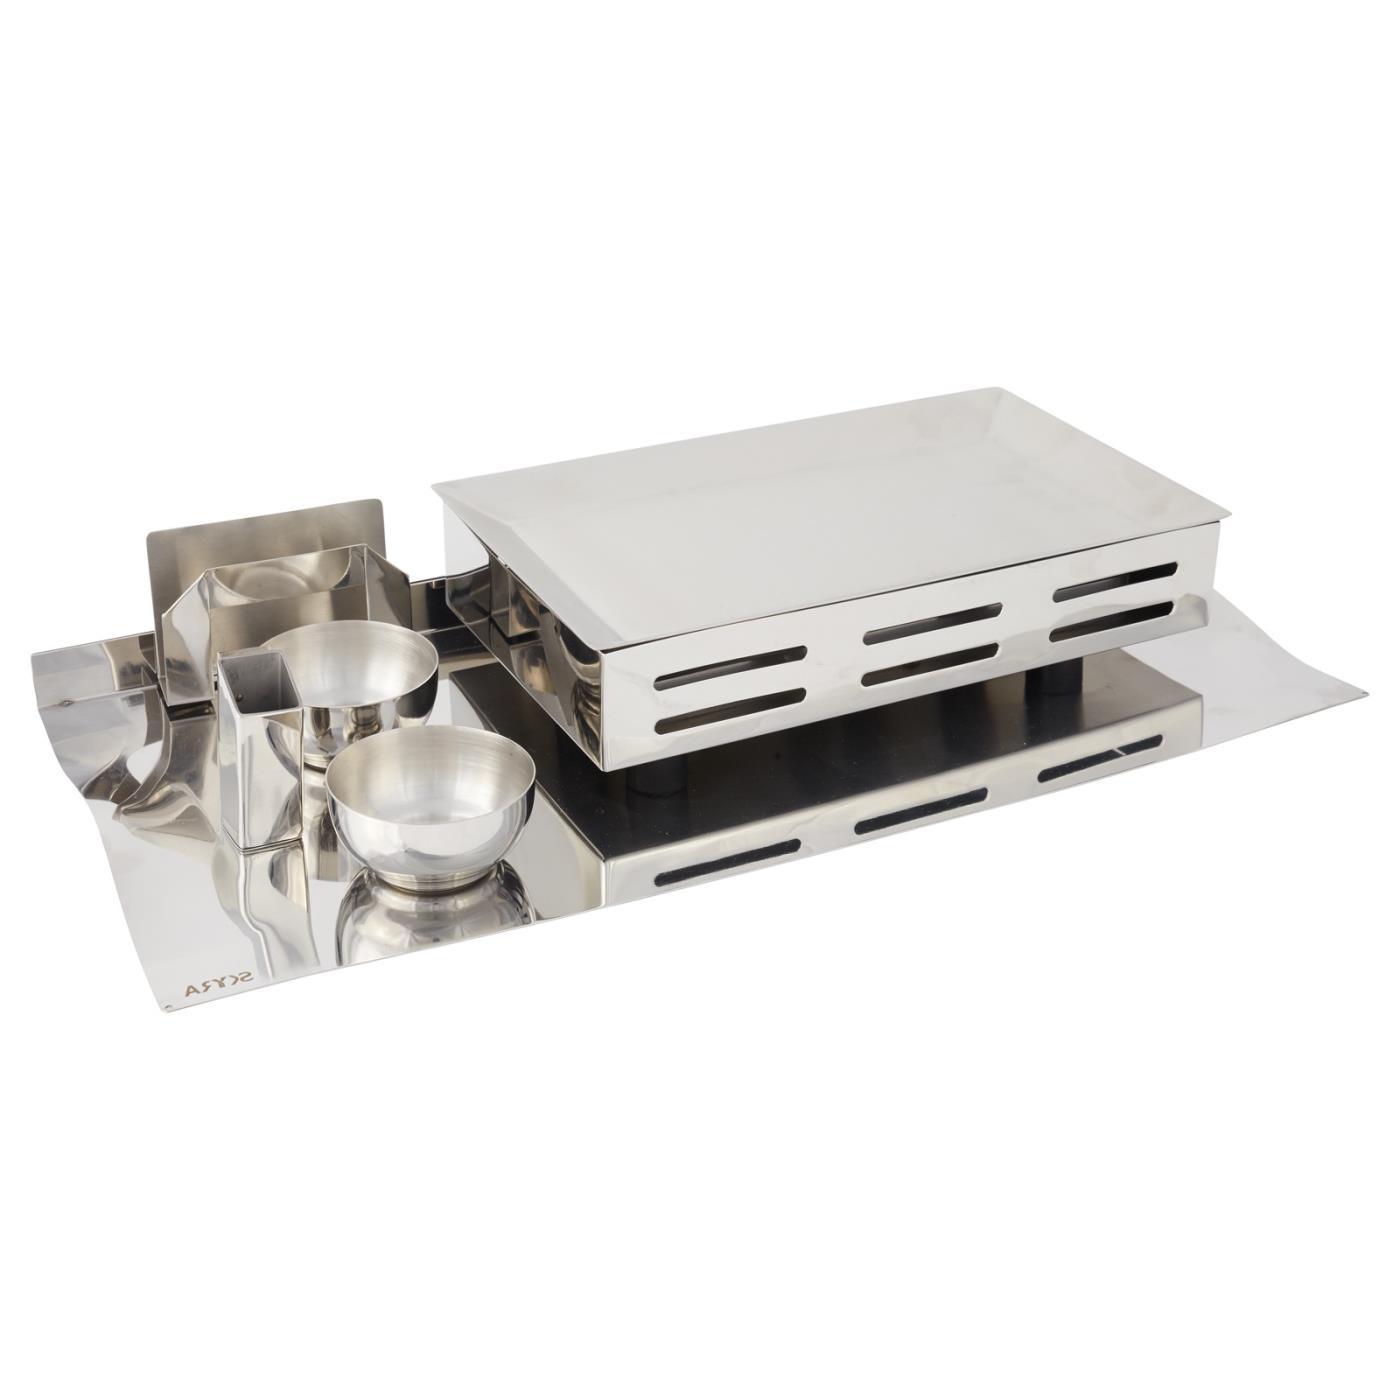 Minibite Modular Warming Tray